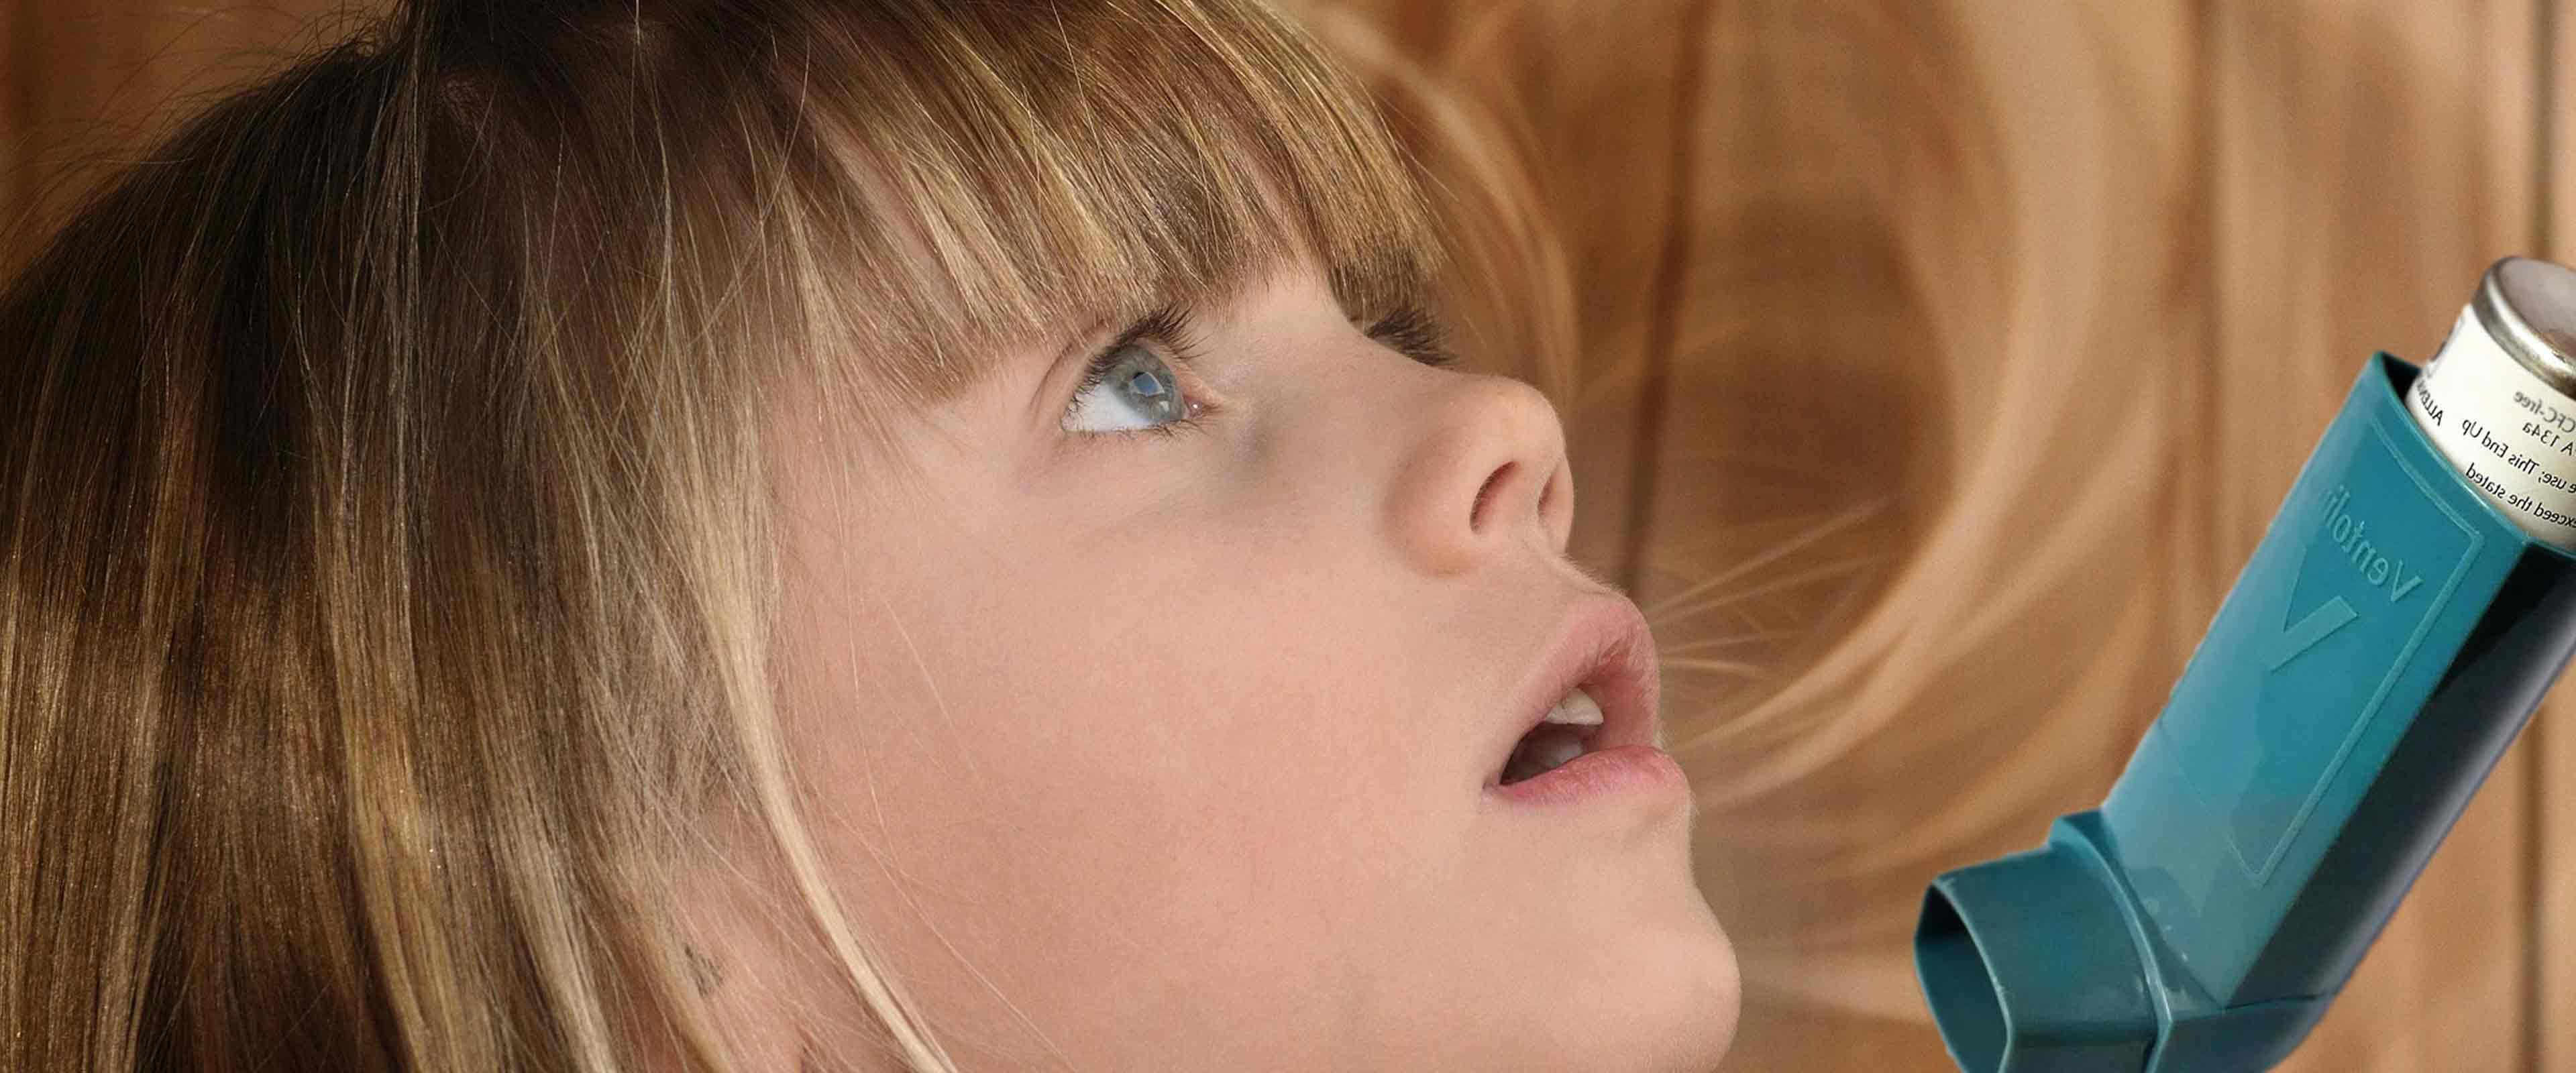 asthma-krankheit-whatshealth